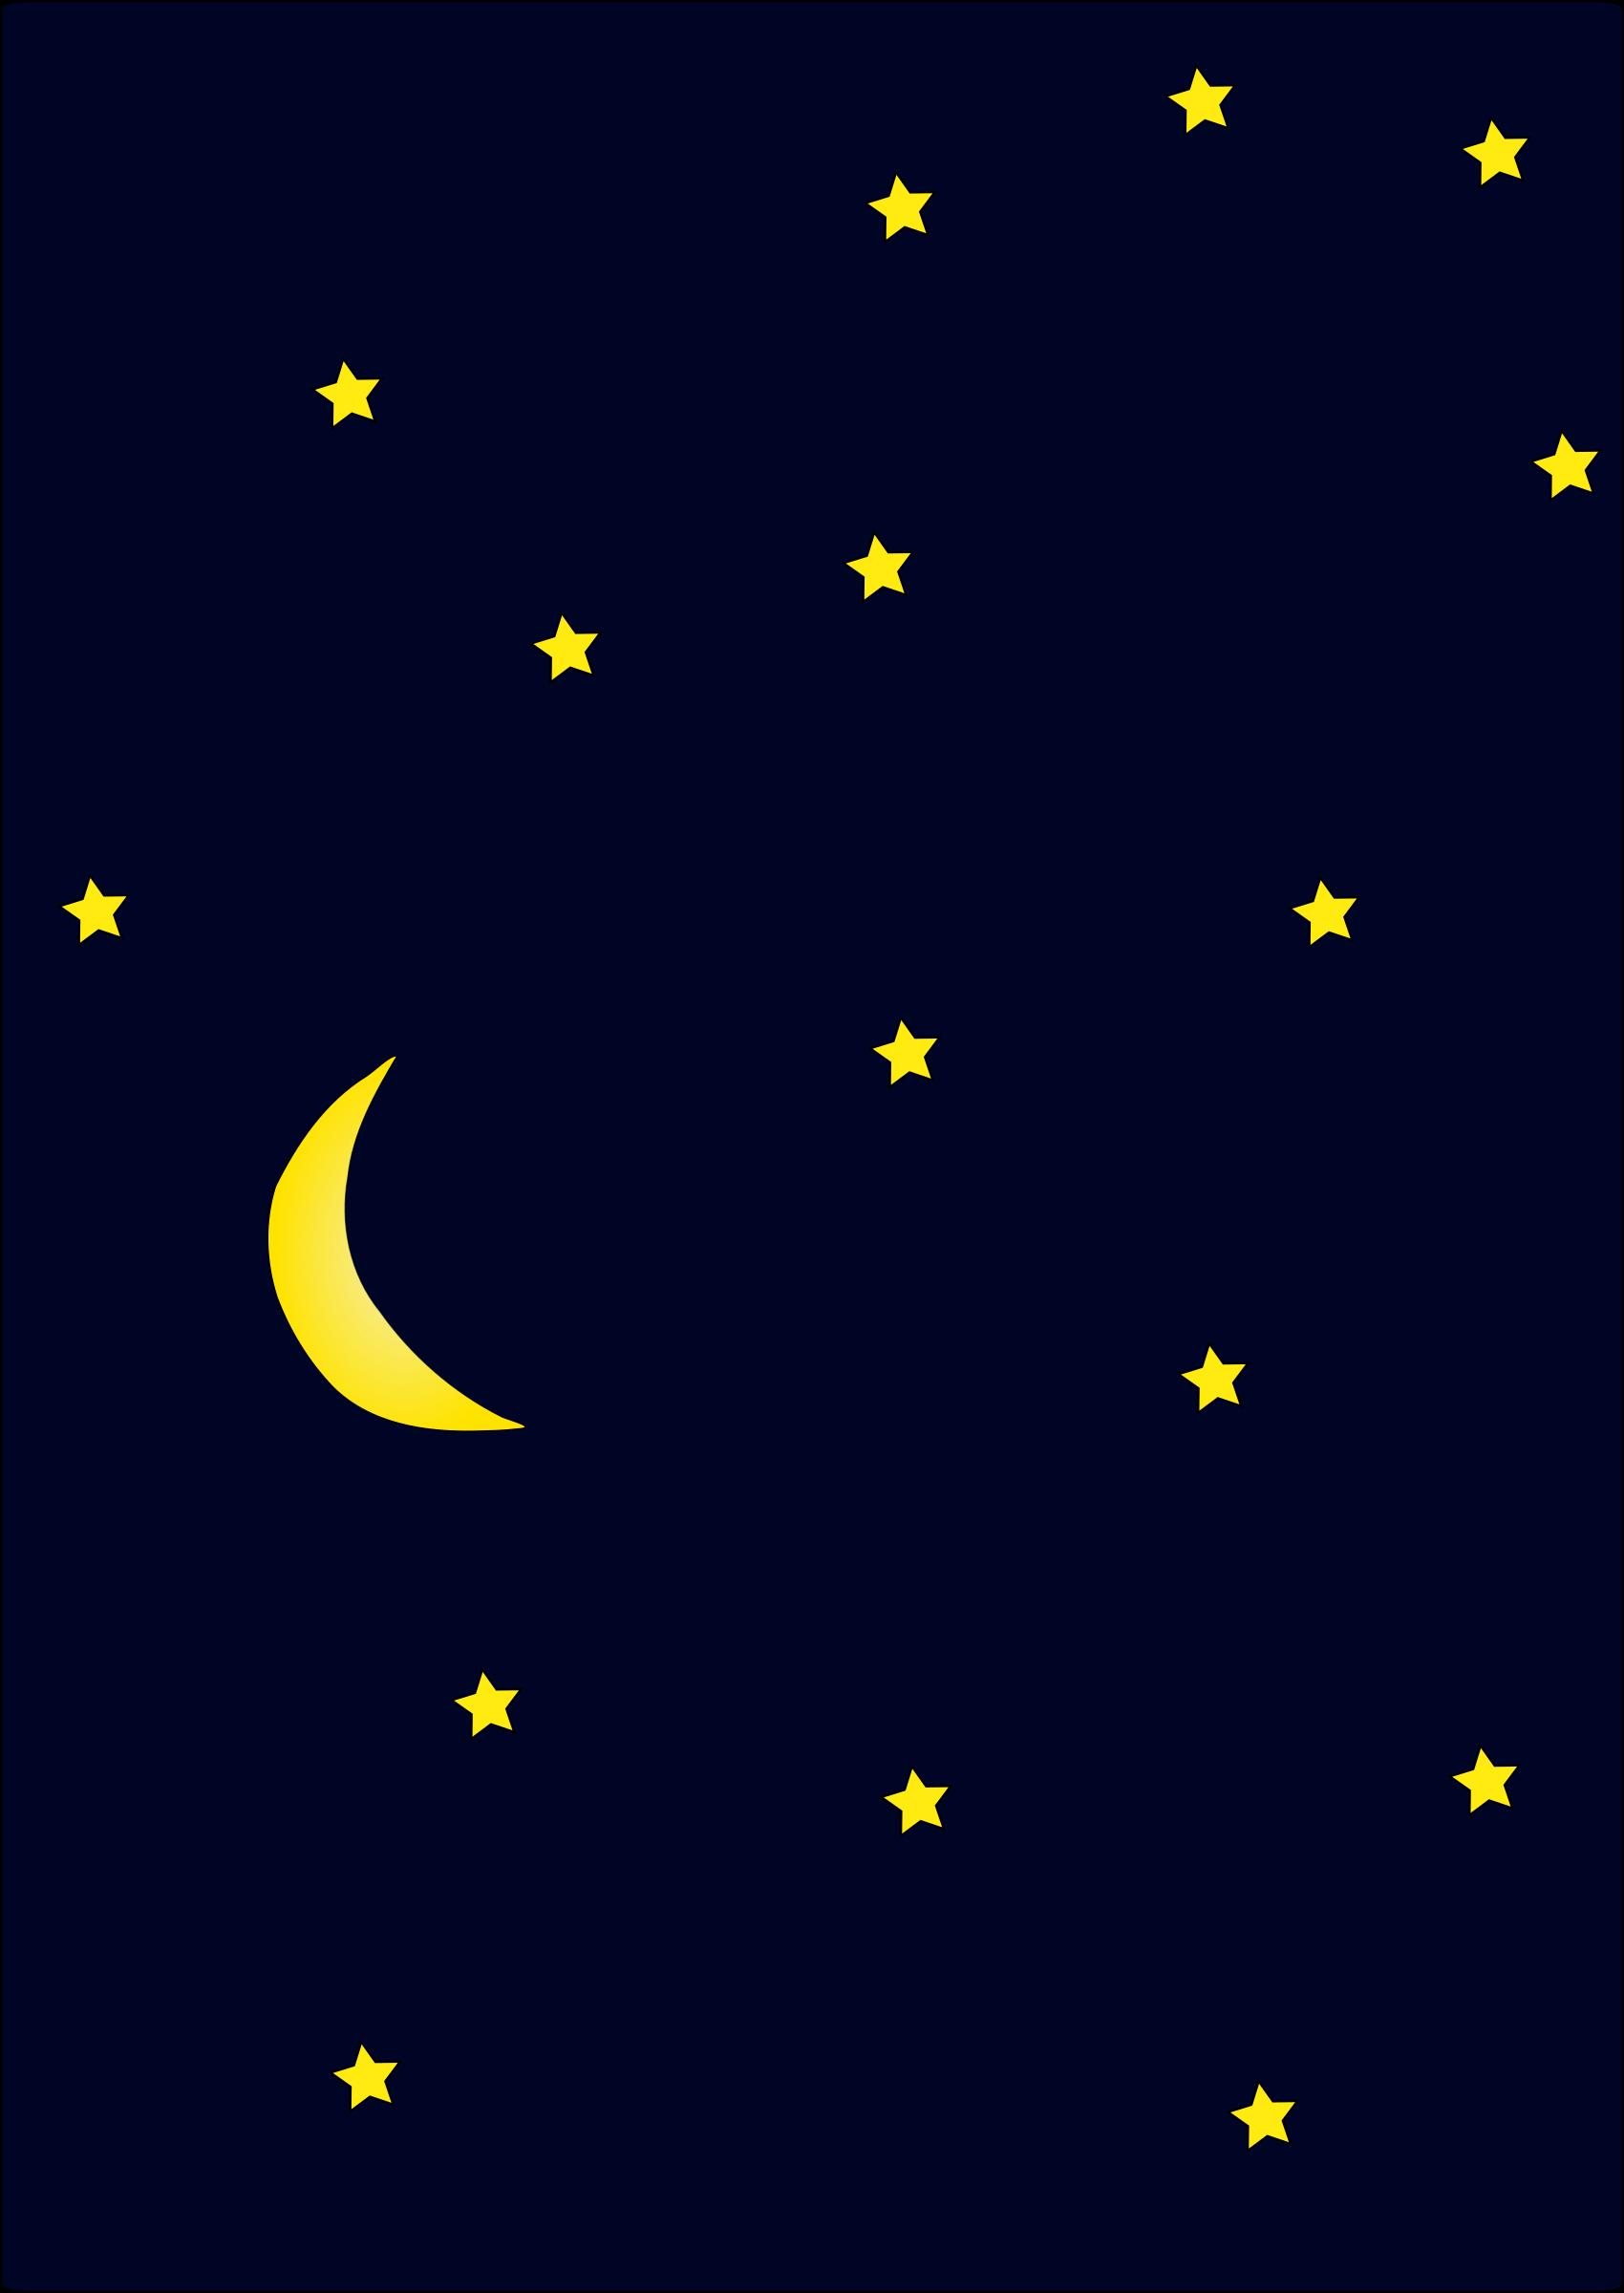 clipart night - photo #17